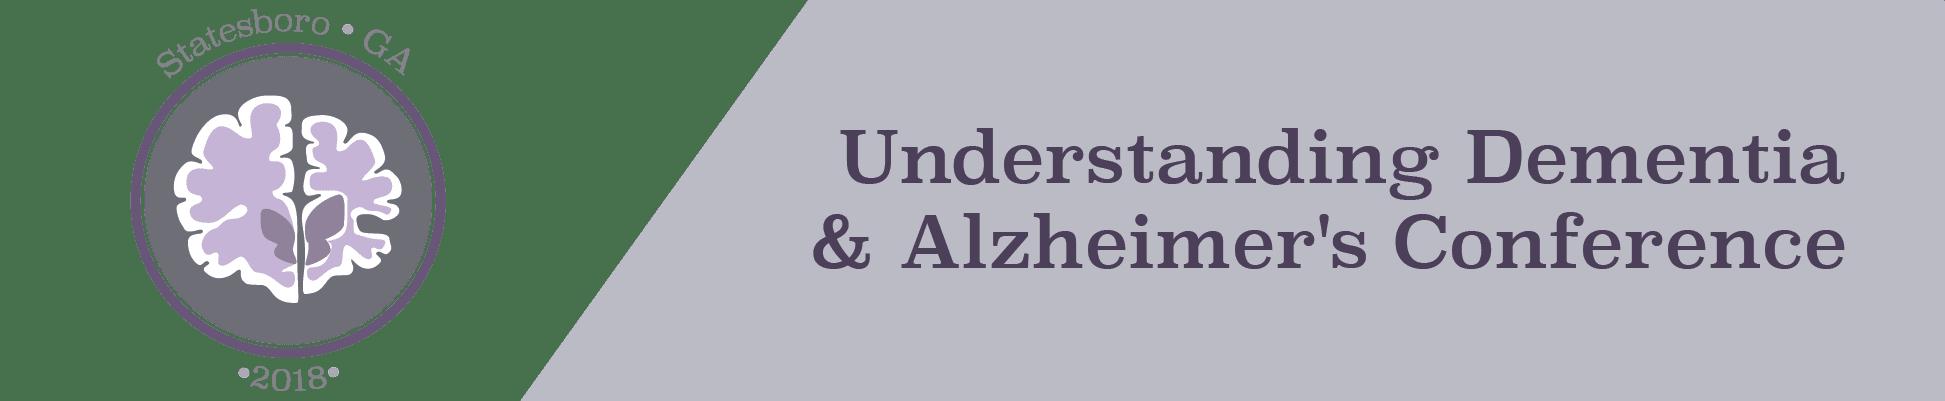 Understanding Dementia & Alzheimer's Conference